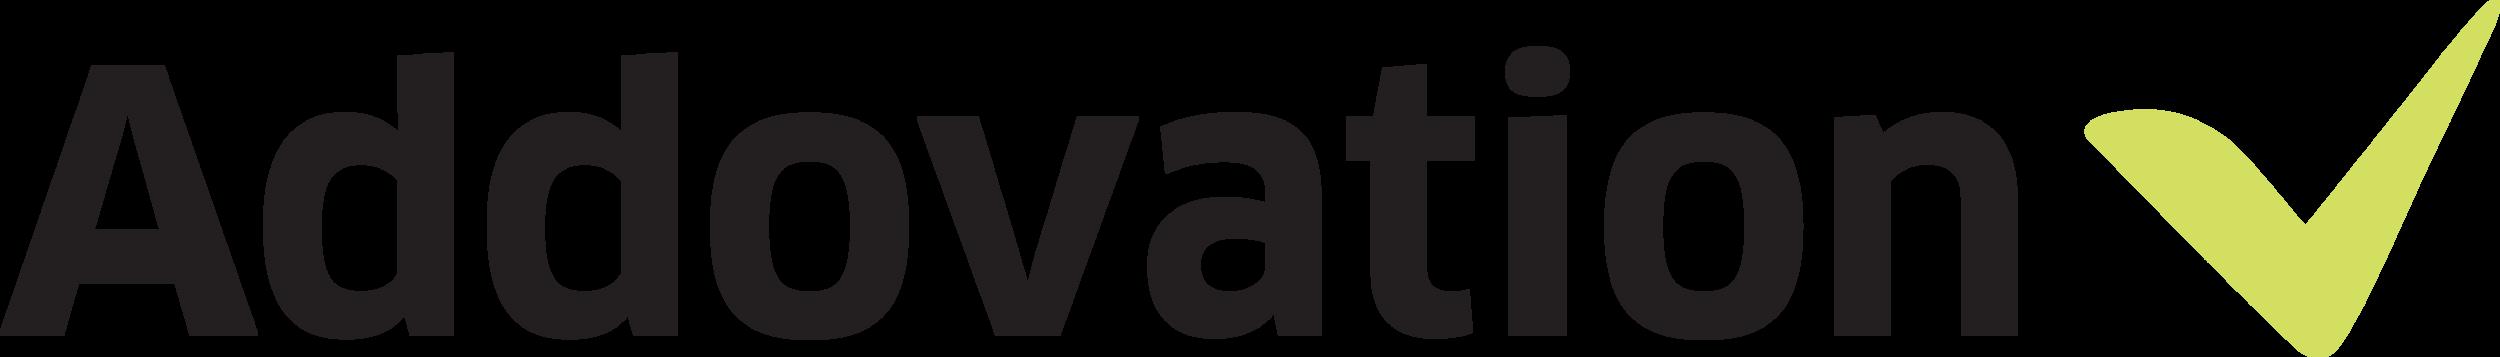 addovation logo.png